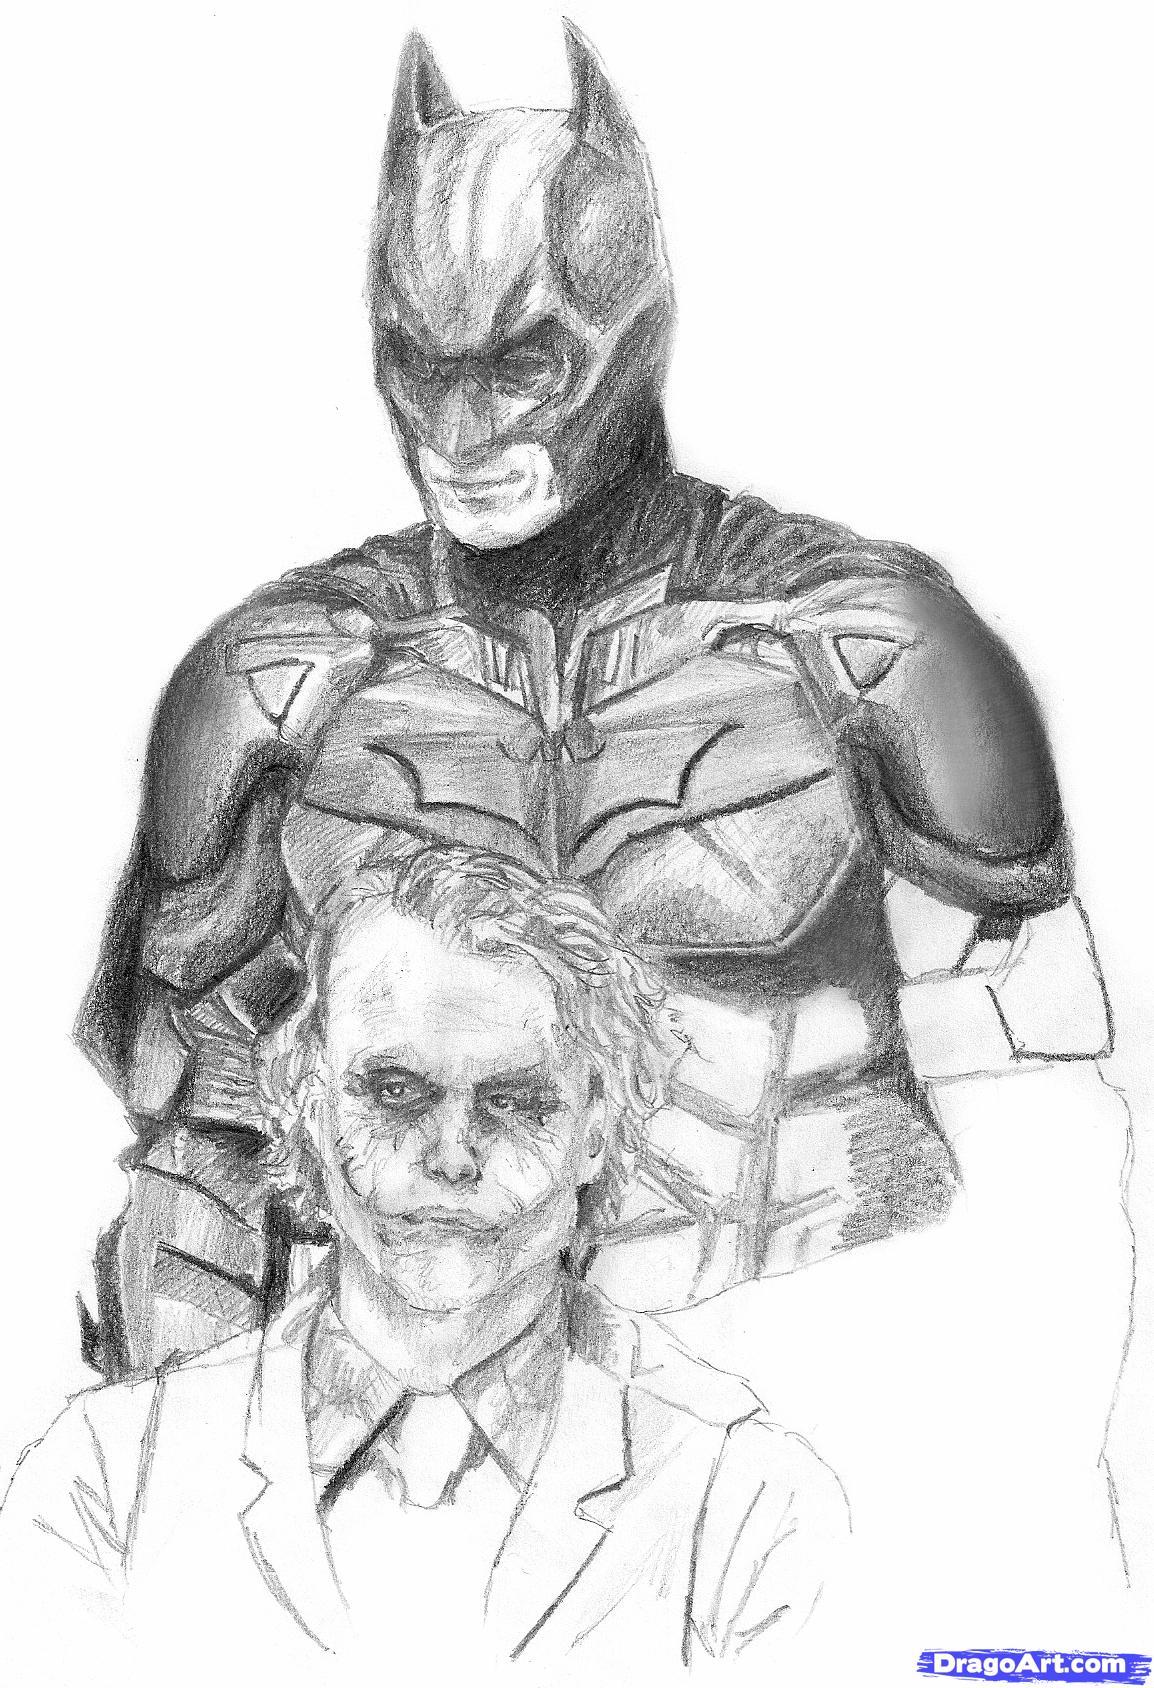 Drawn batman batman dark knight By Step the  to